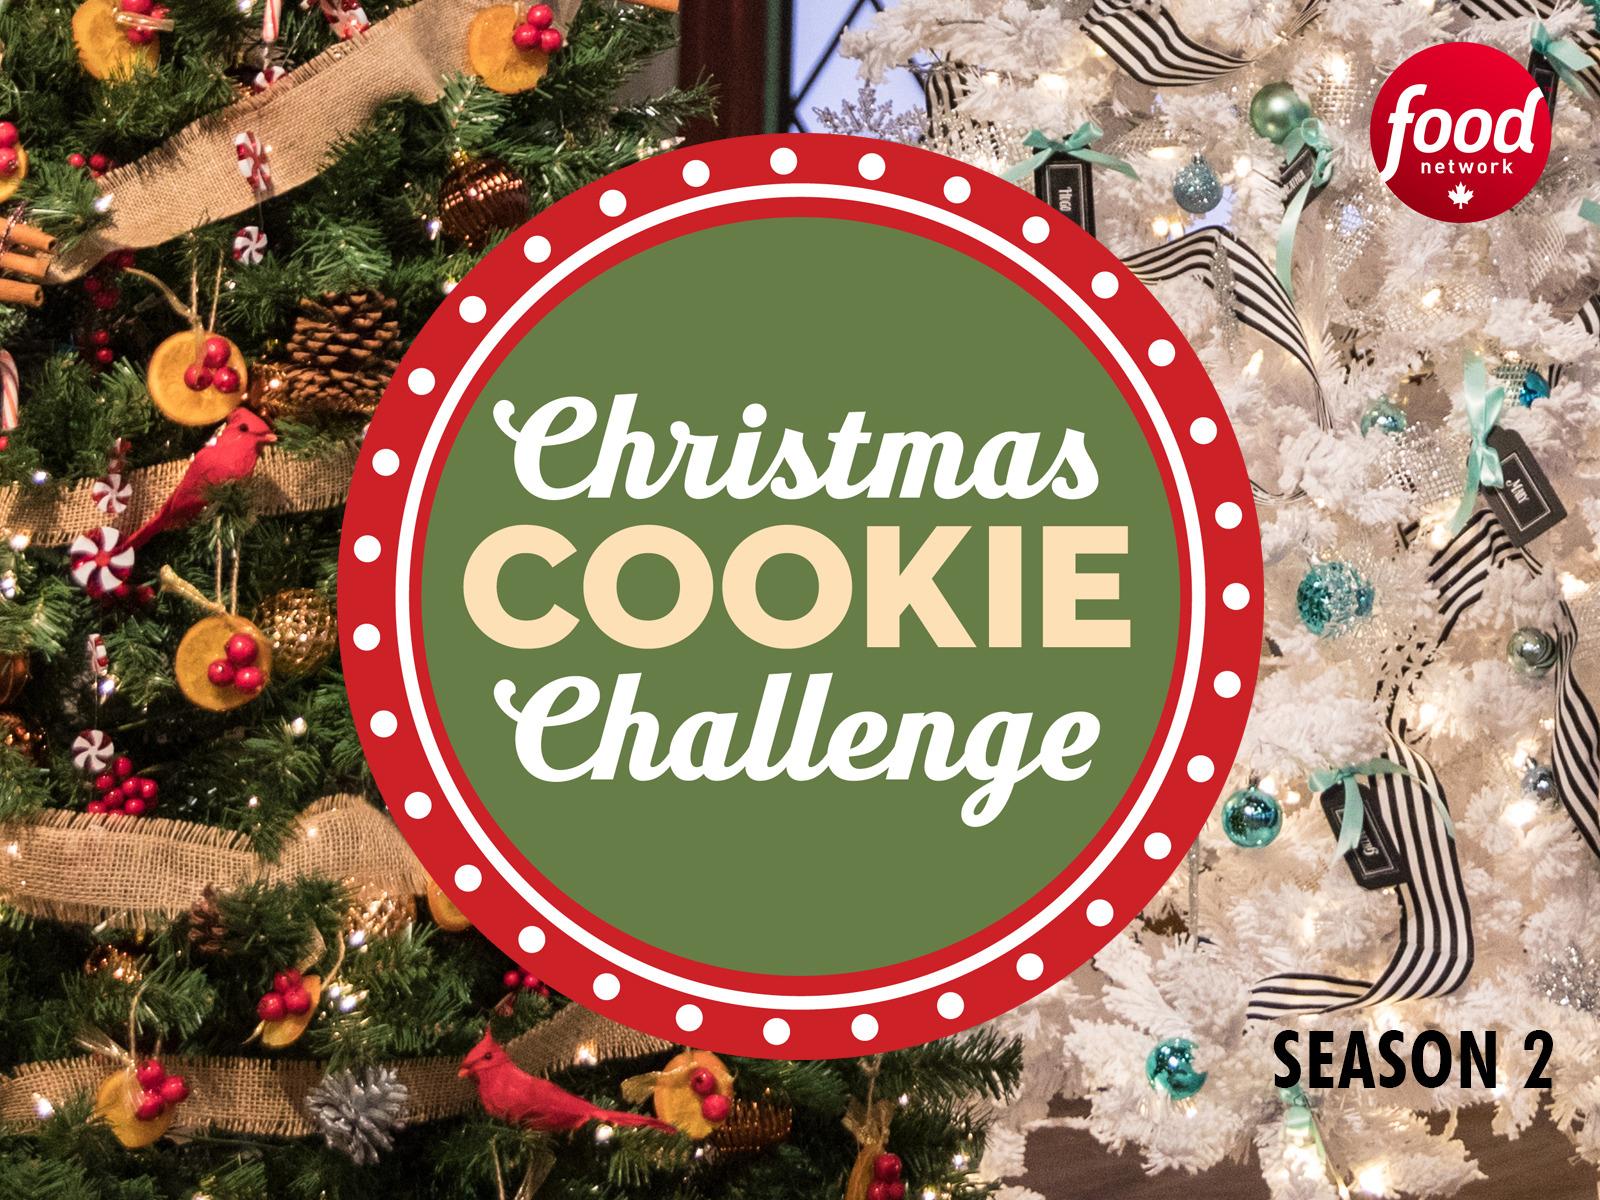 Christmas Cookie Challenge.Prime Video Christmas Cookie Challenge Season 2